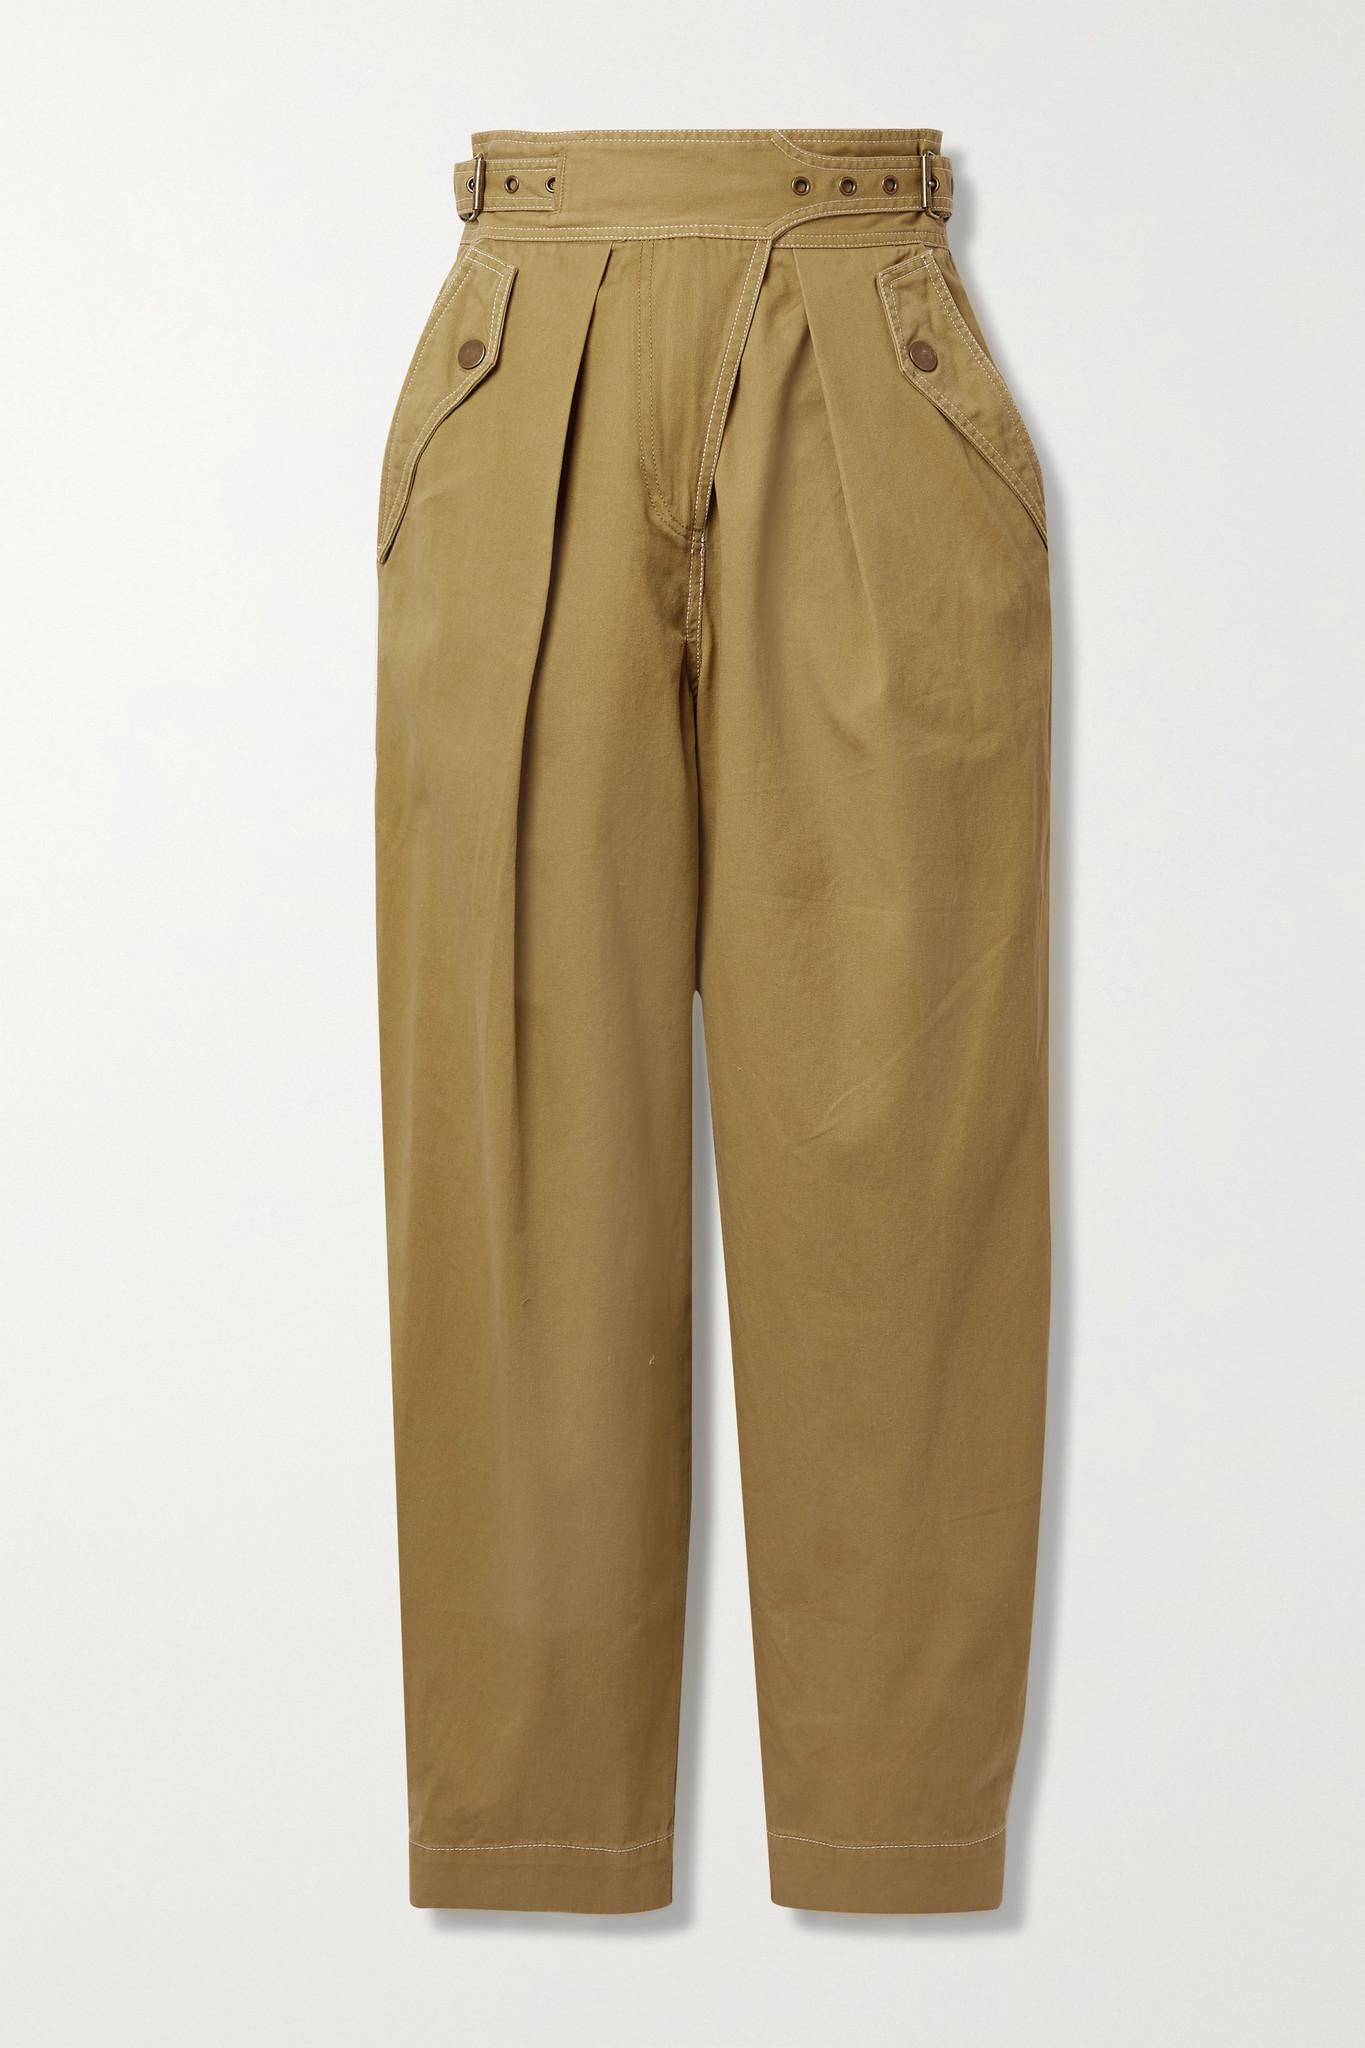 ULLA JOHNSON - Dune 纯棉斜纹布锥形裤 - 中性色 - US8